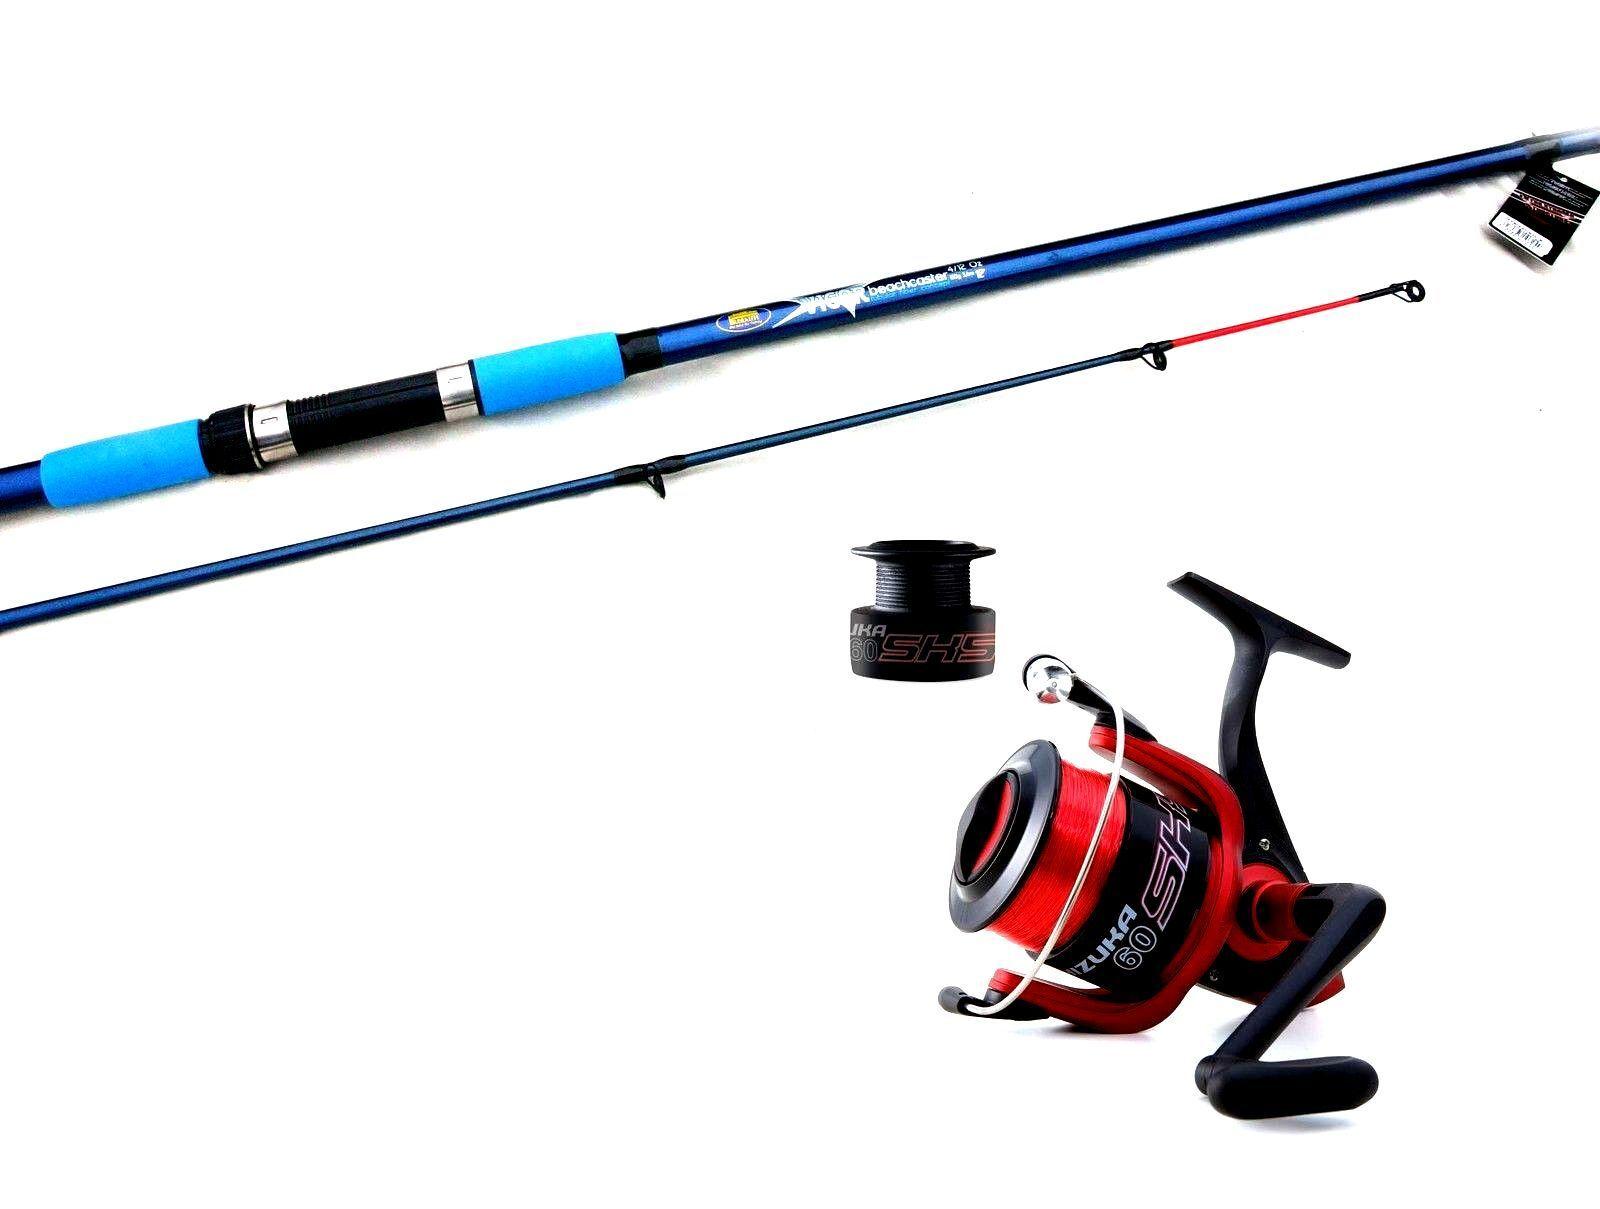 Lineaeffe Vigor Beachcaster rod 12ft 3.6mtr 4-8oz & SK 070 Fishing Reel & Line